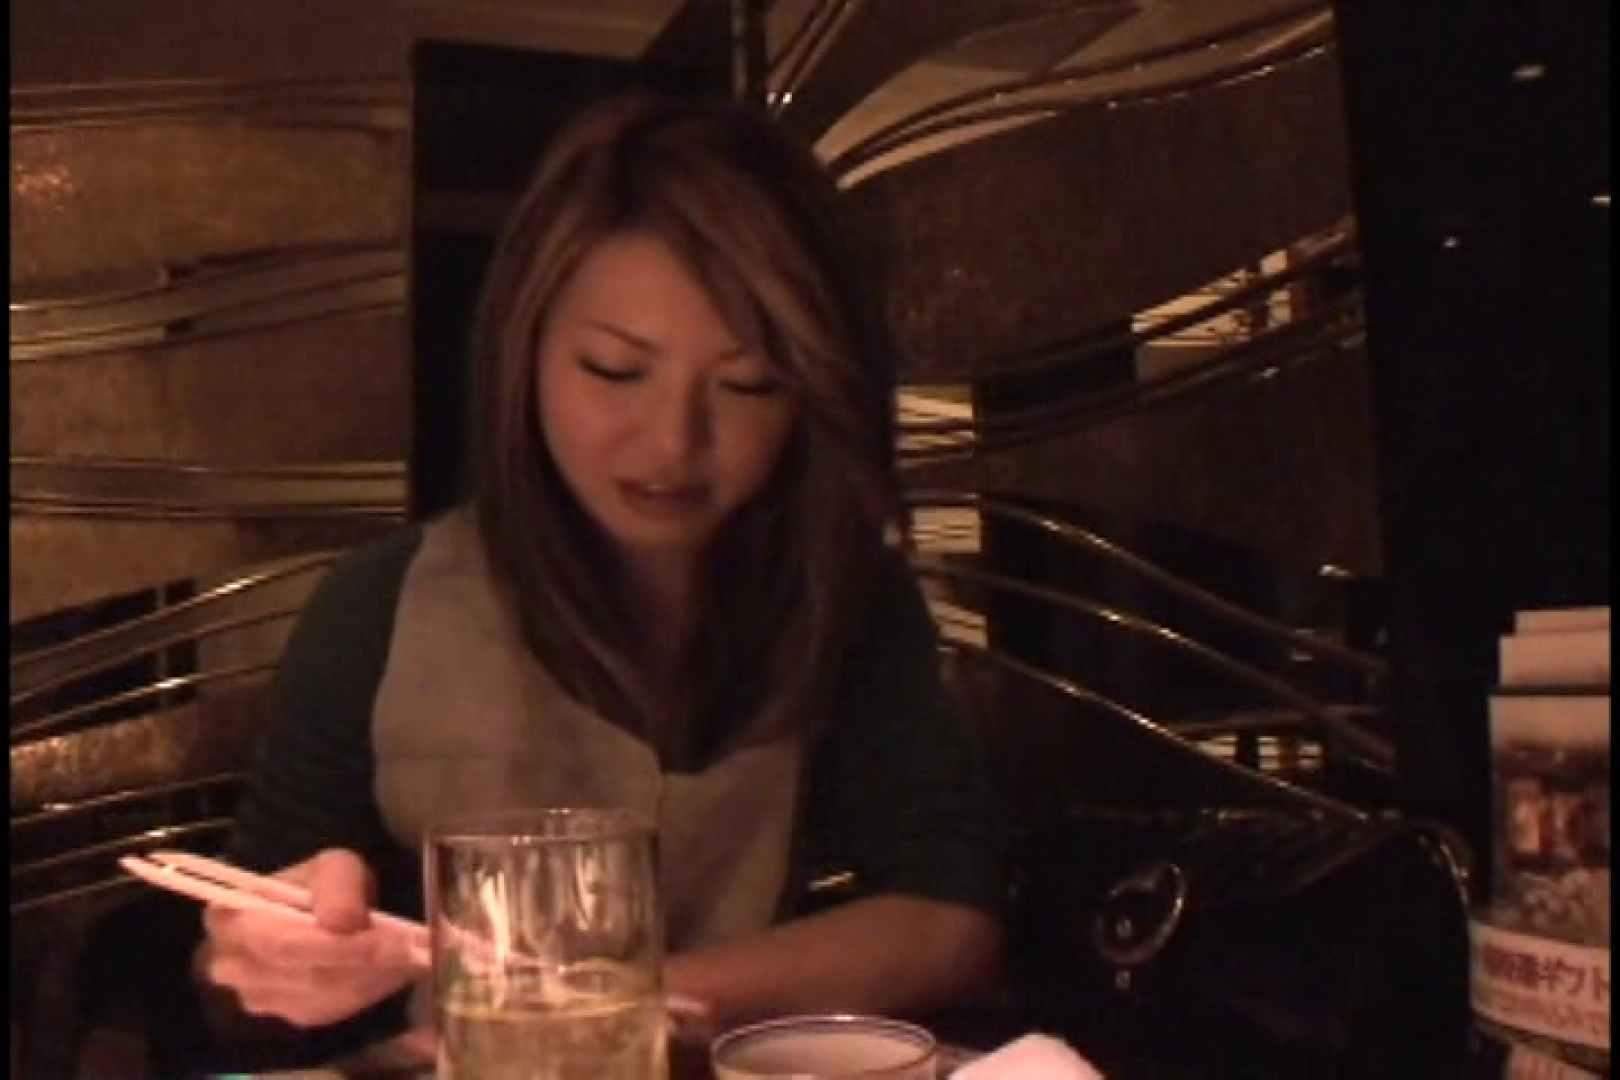 JDハンター全国ツアー vol.012 前編 女子大生のエロ動画  91PIX 40